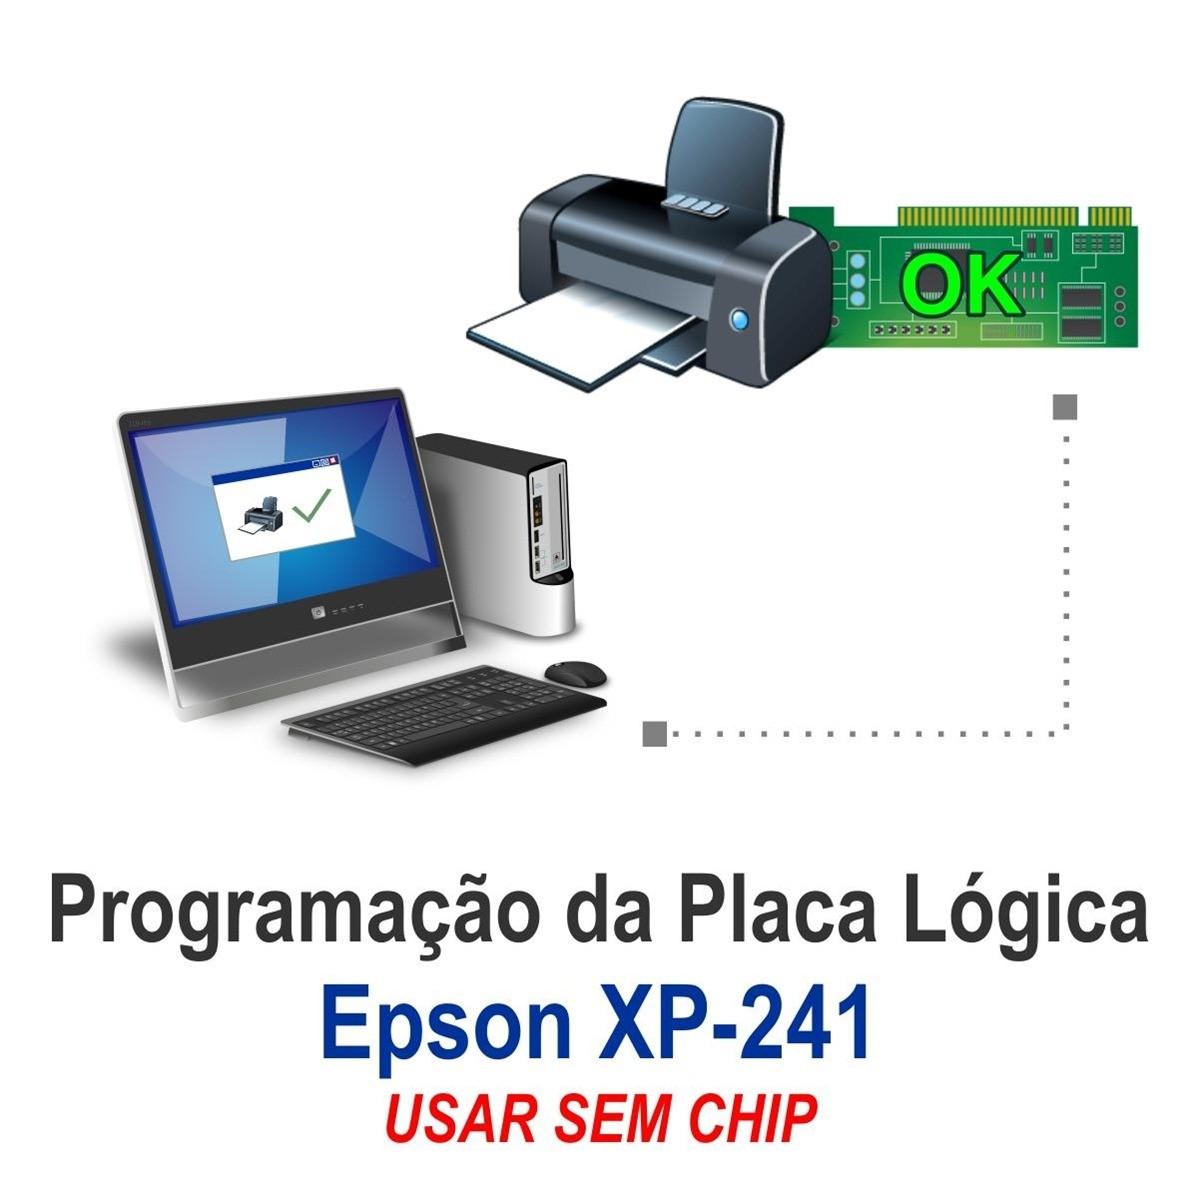 Chave de desbloqueio XP230 XP231 XP235 XP240 XP241 XP245 XP340 XP431 XP434 XP440 XP441 XP442 XP445 para Epson